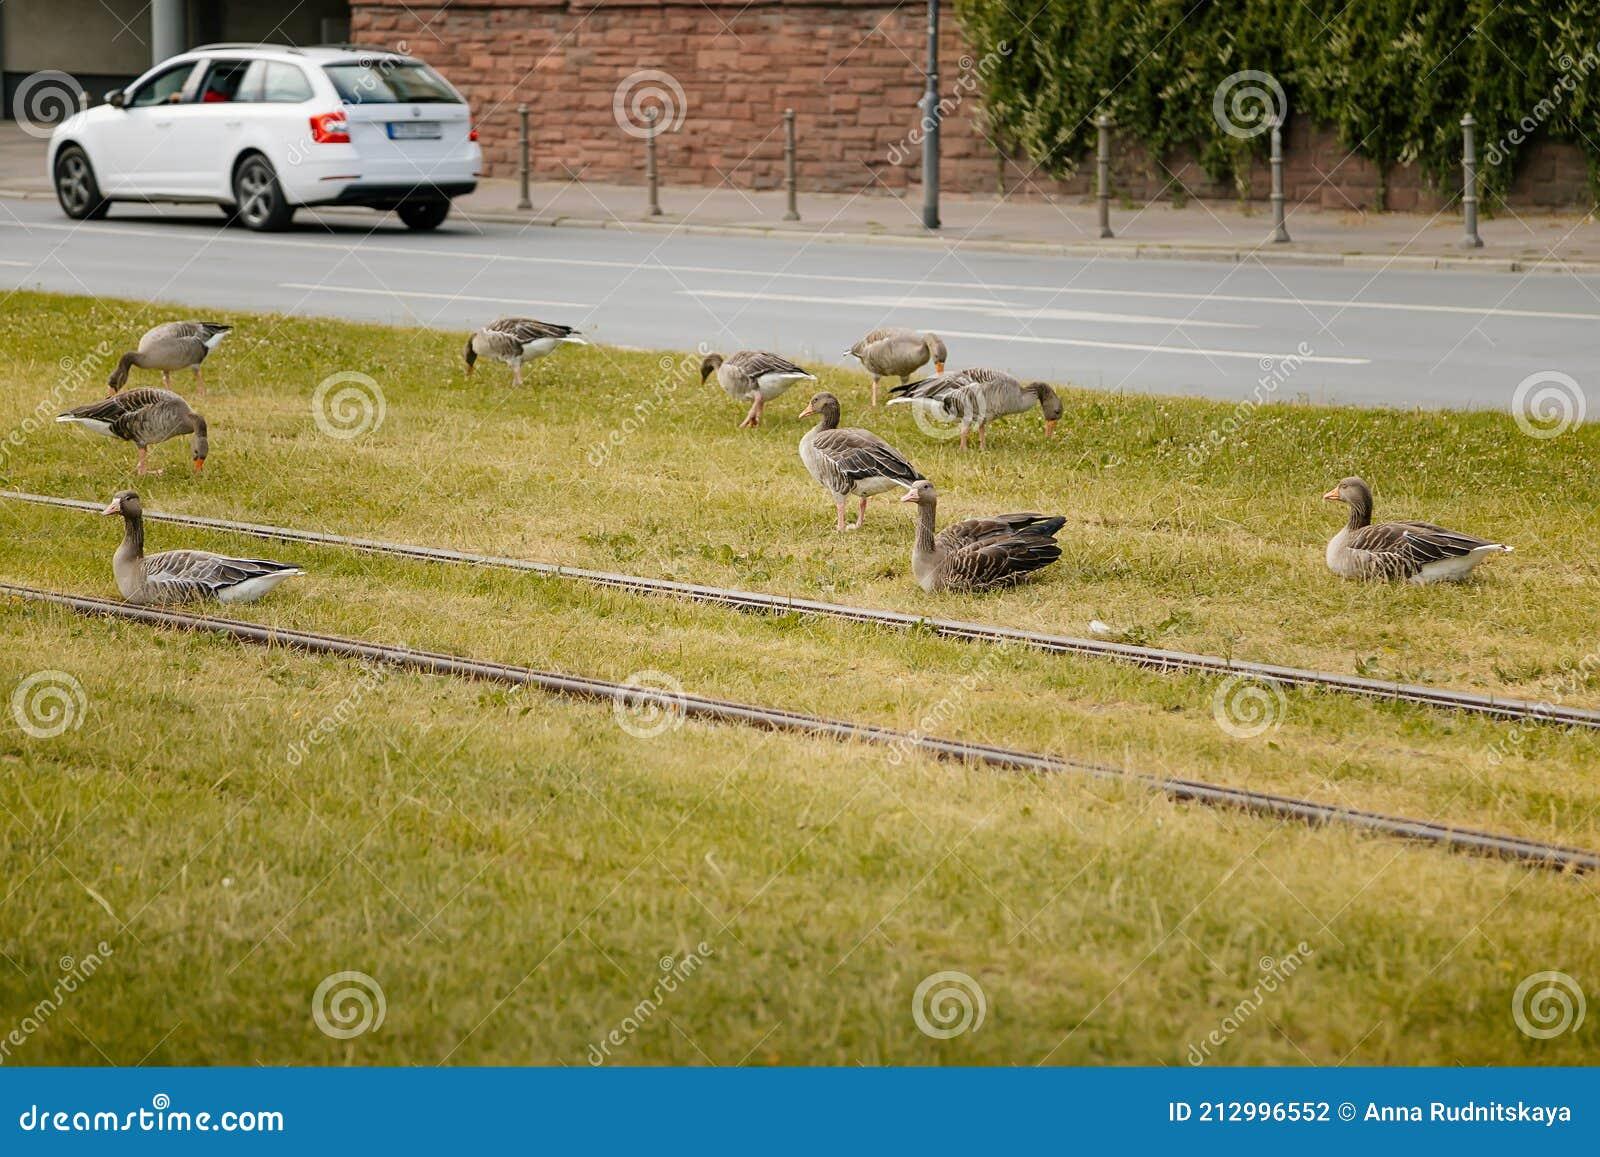 greylag-geese-green-meadow-city-tram-rails-summer-birds-territory-near-residential-areas-eco-friendly-environment-212996552.jpg